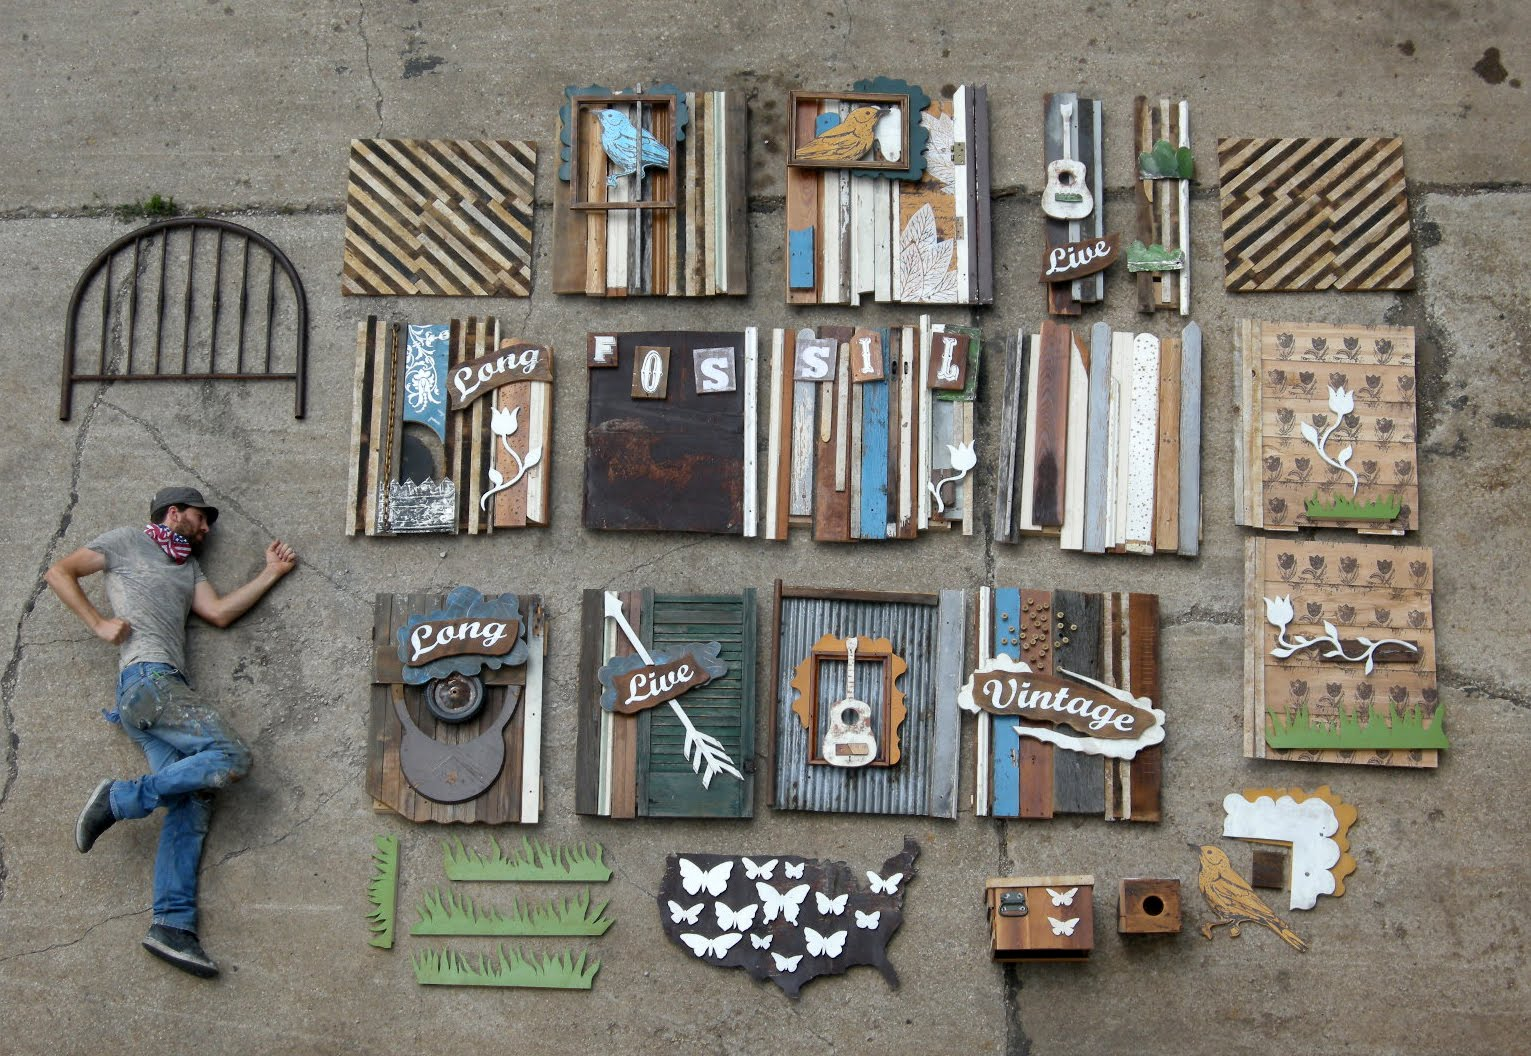 http://2.bp.blogspot.com/_BMnG7Fc4iIM/TEjBB9jkqJI/AAAAAAAACoc/yEuStNc2-J4/s1600/Dallas+Window+Display+Materials+with+Dolan.jpg